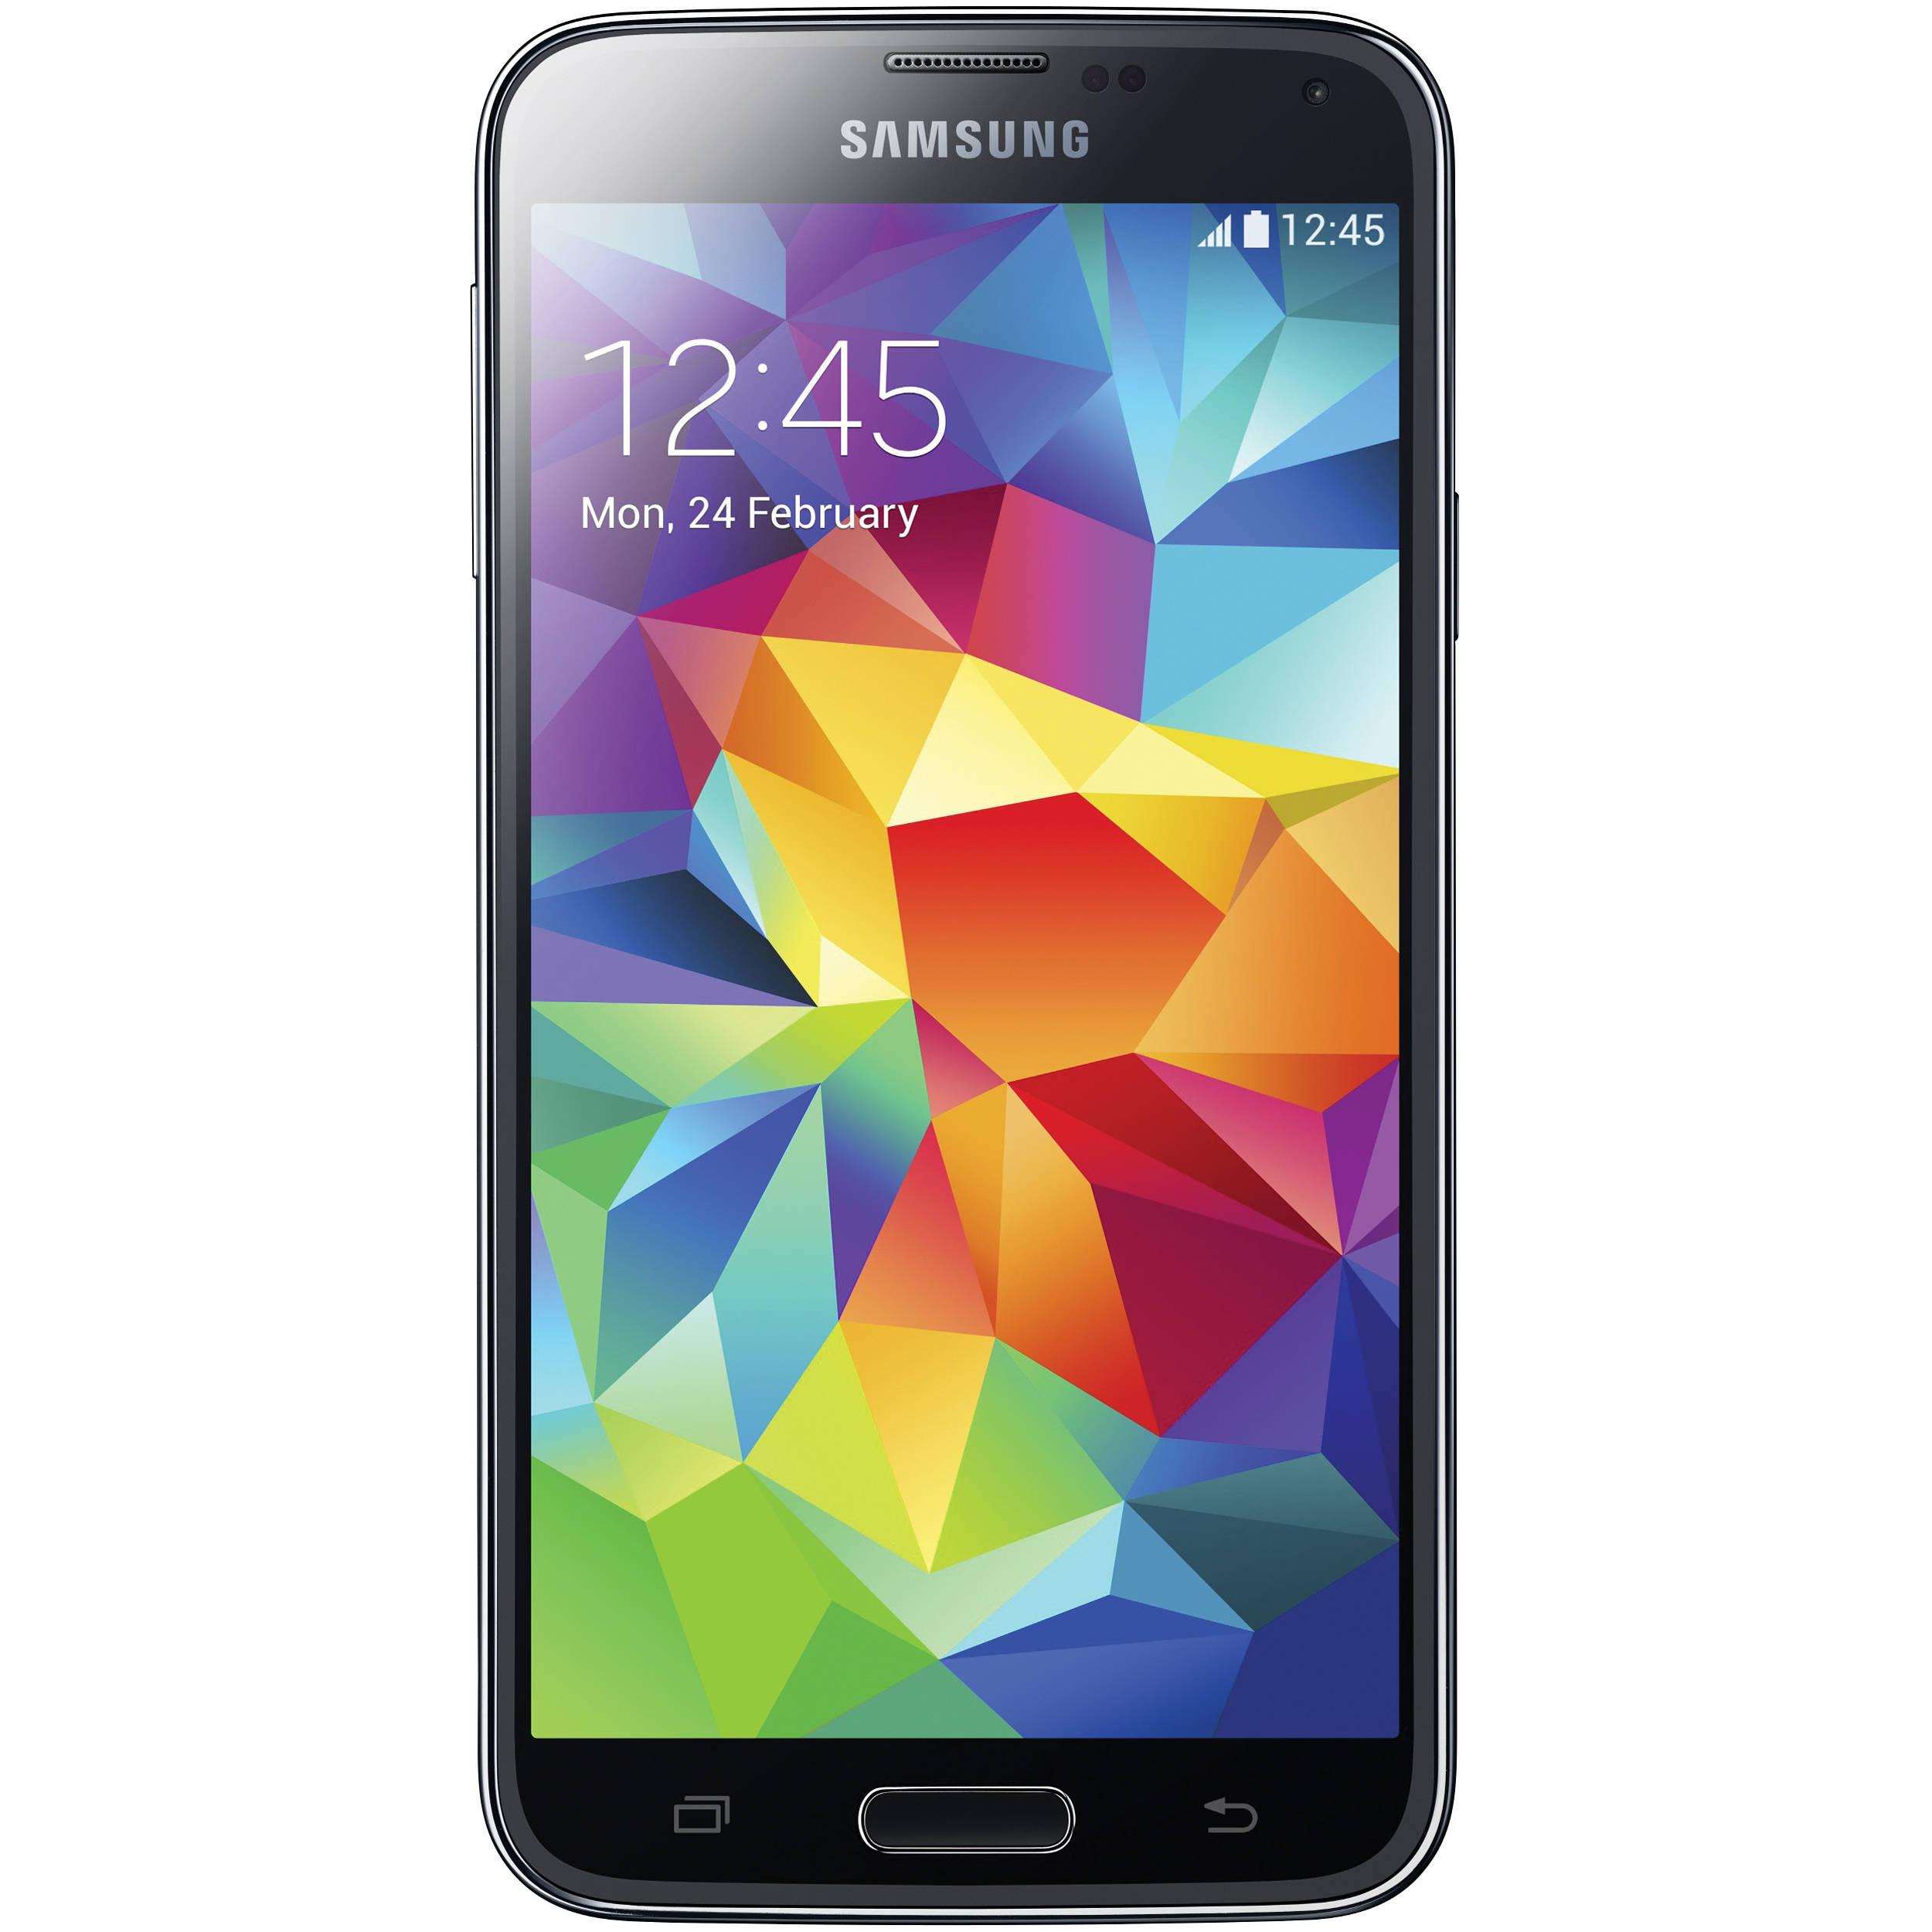 Samsung Galaxy S5 Sm G900f 16gb Smartphone Sm G900f Black B H